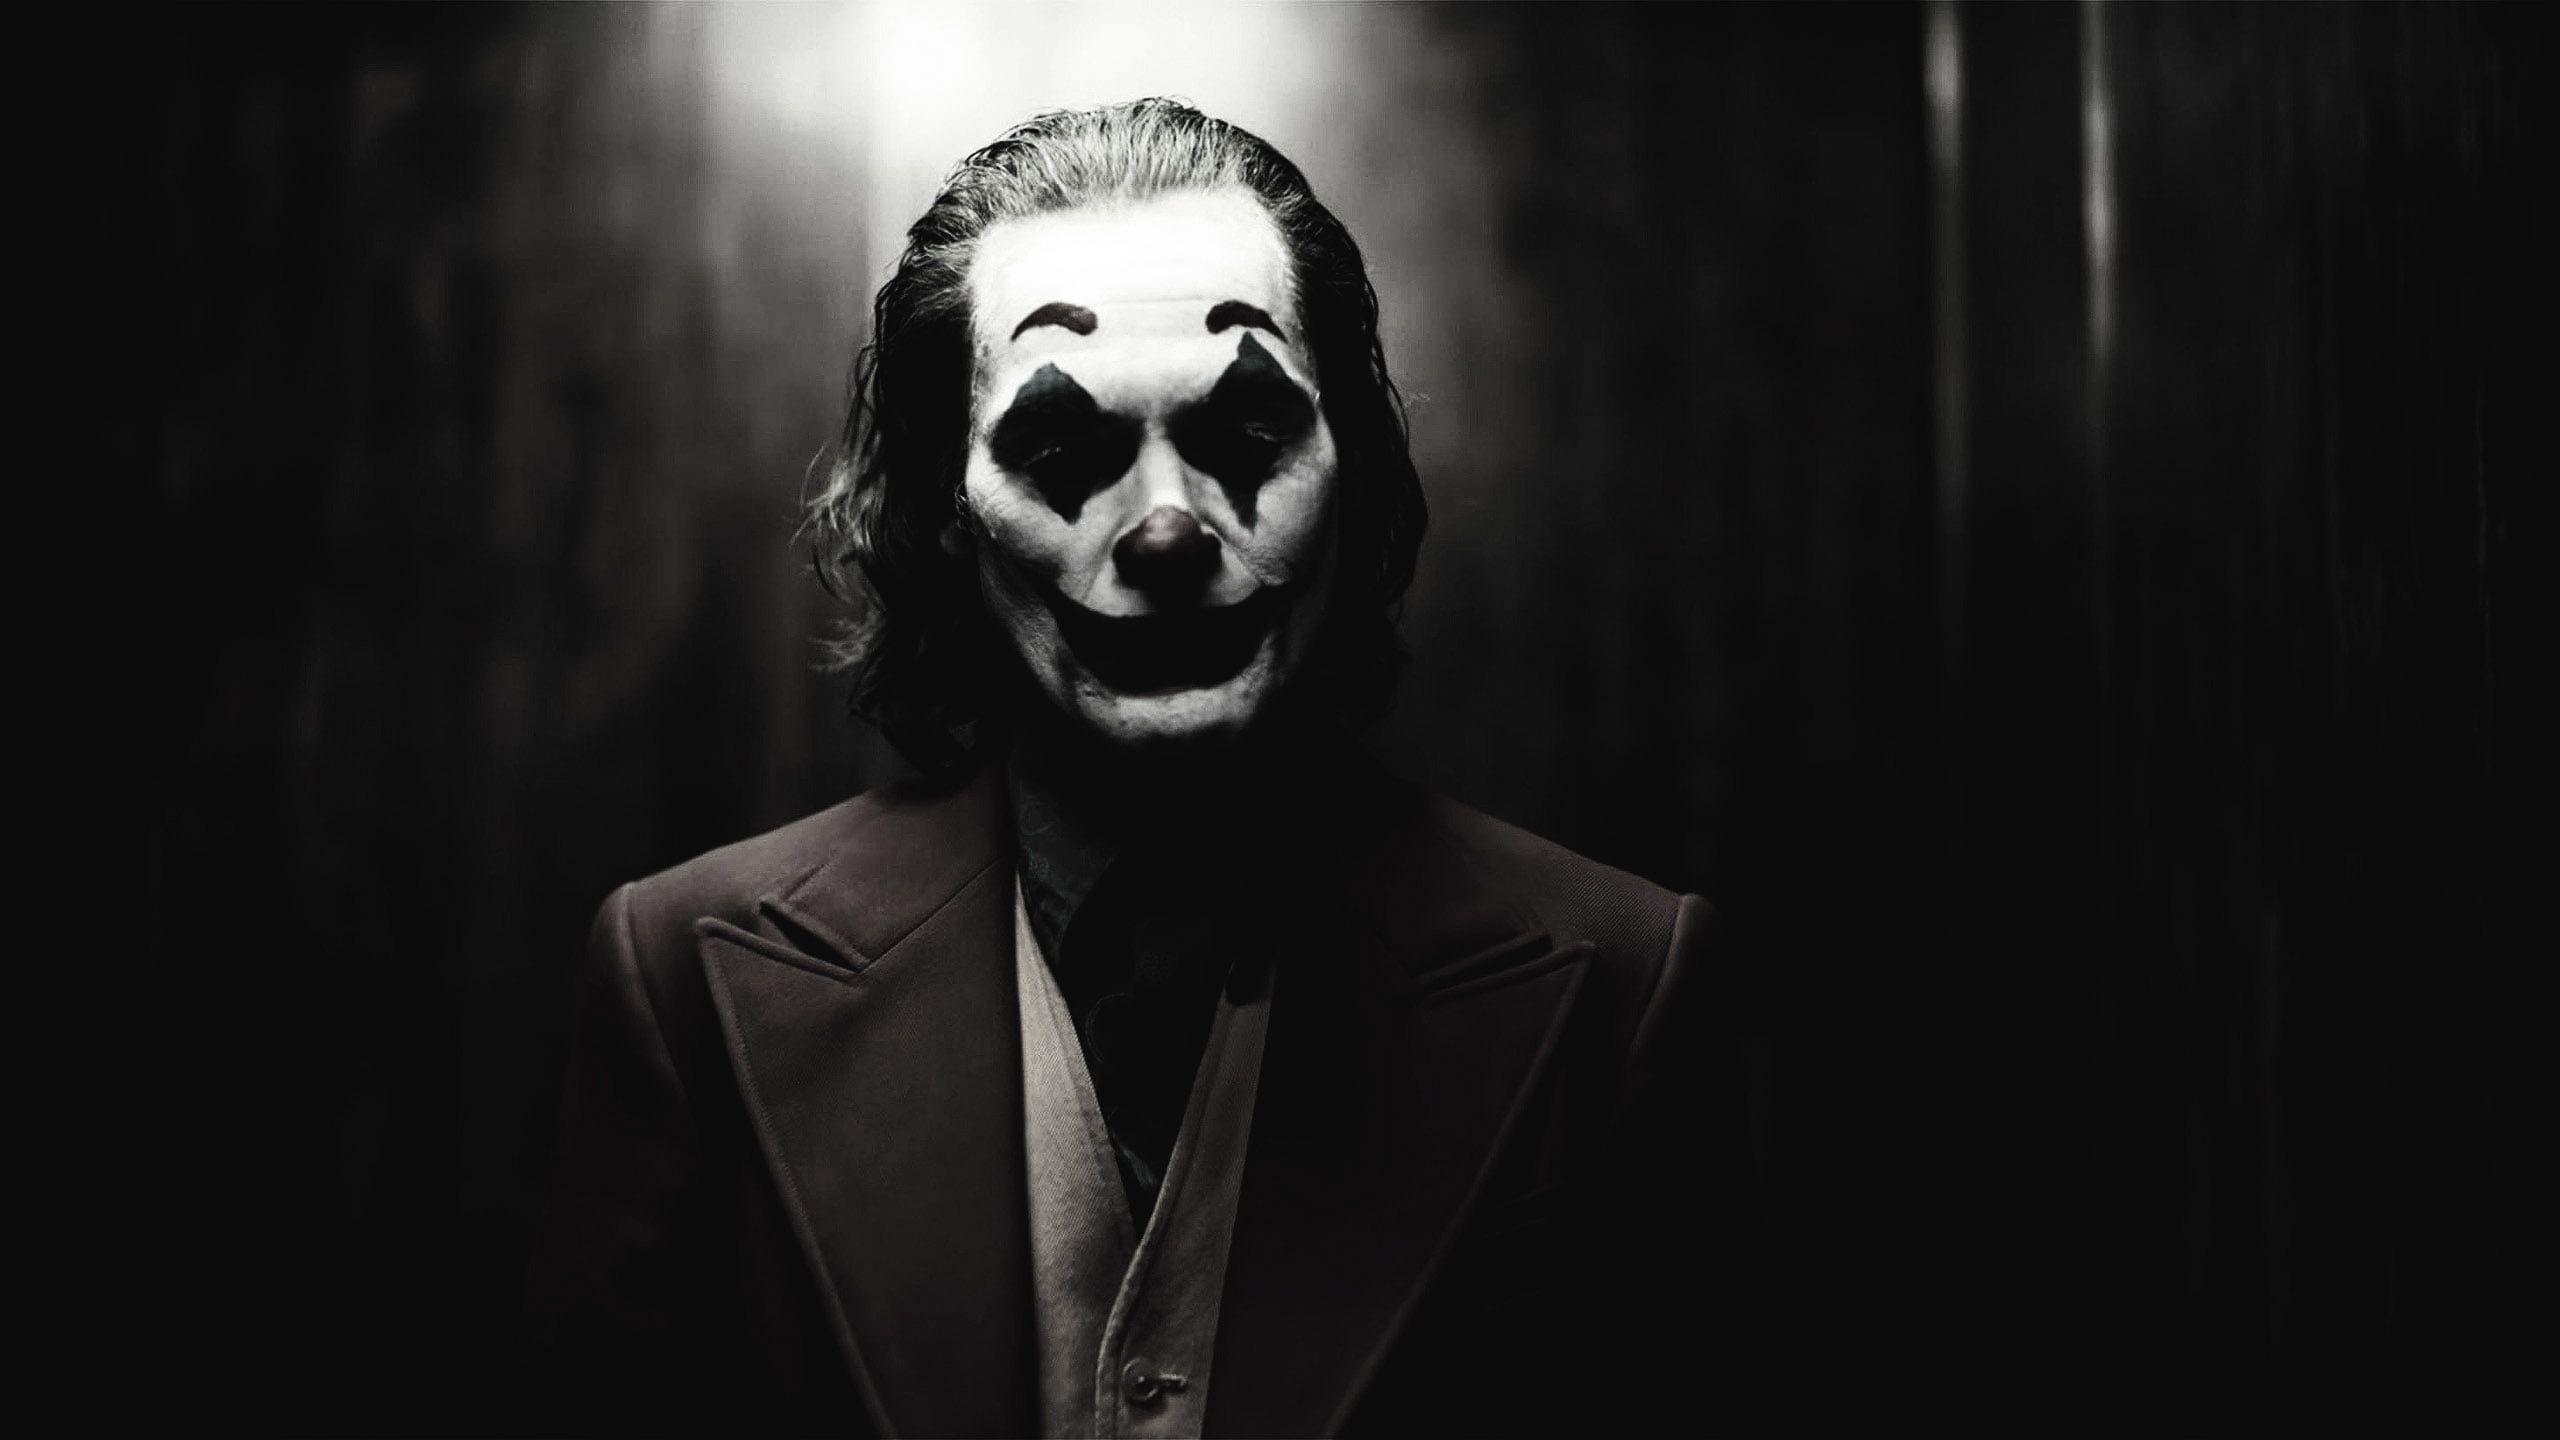 Joker 2019 Black Joker Wallpaper 4k - Wallpaper HD New